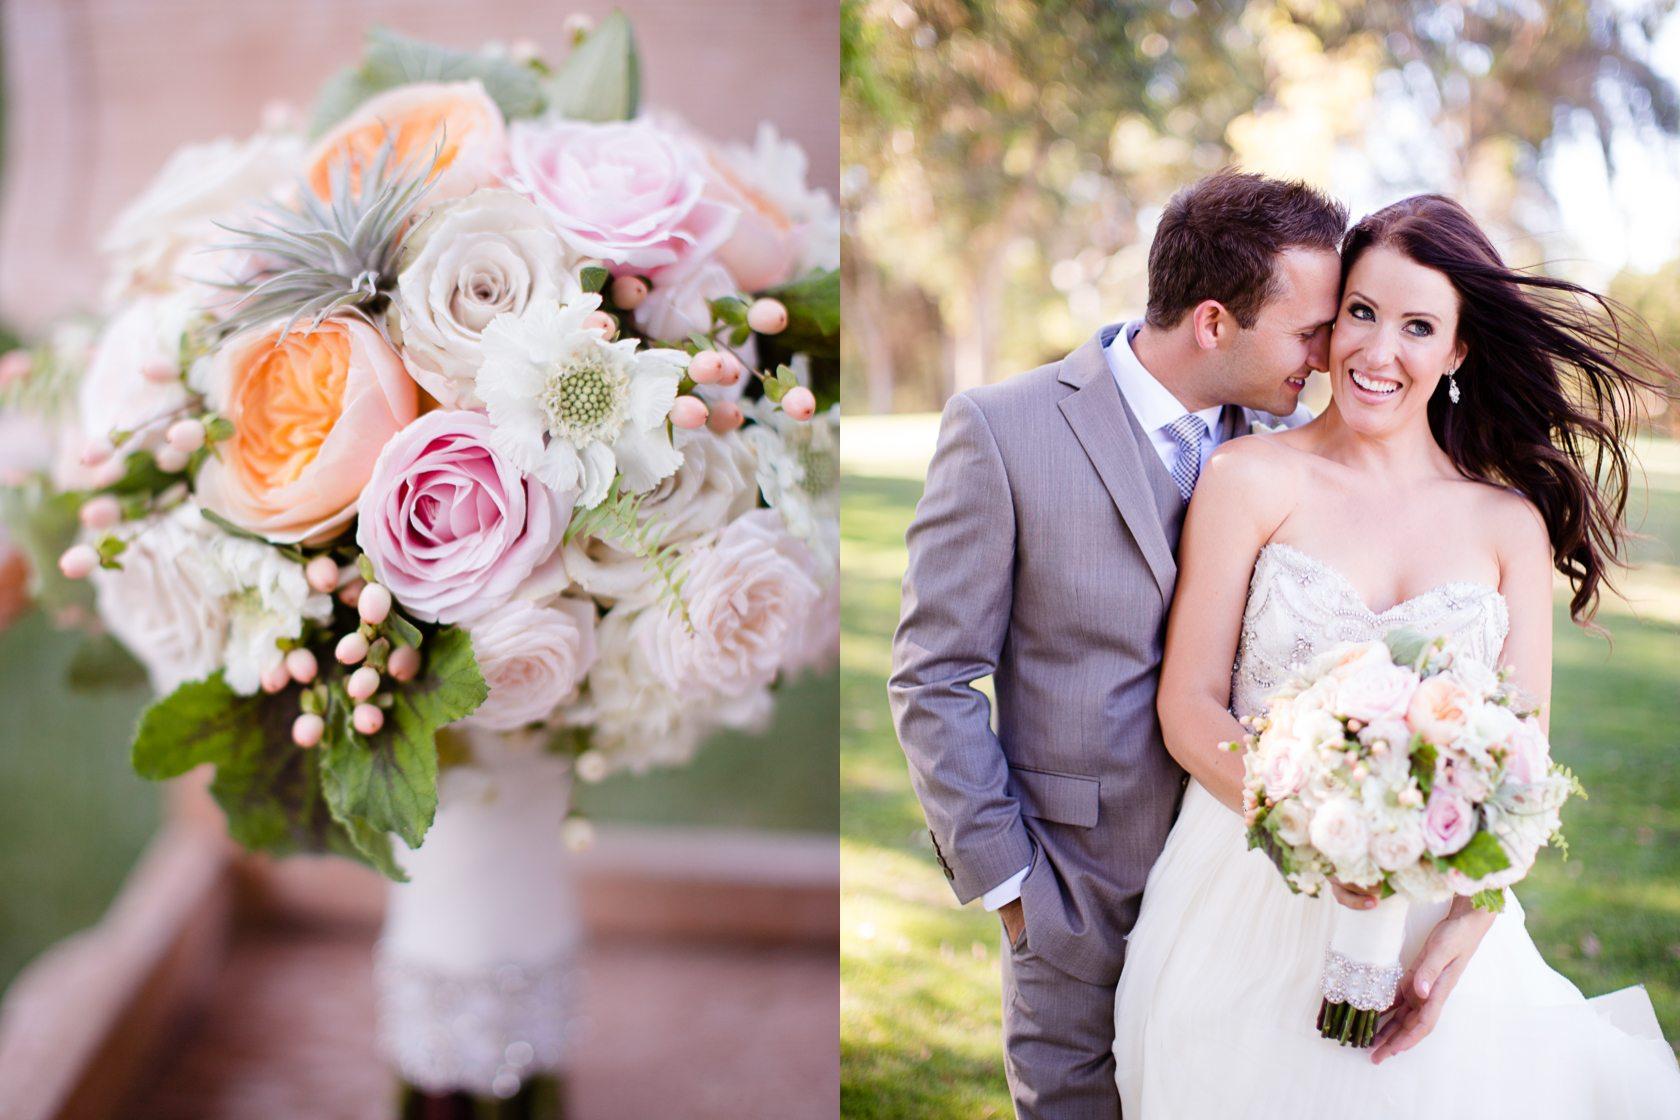 Temecula_Creek_Inn_Wedding_005.jpg